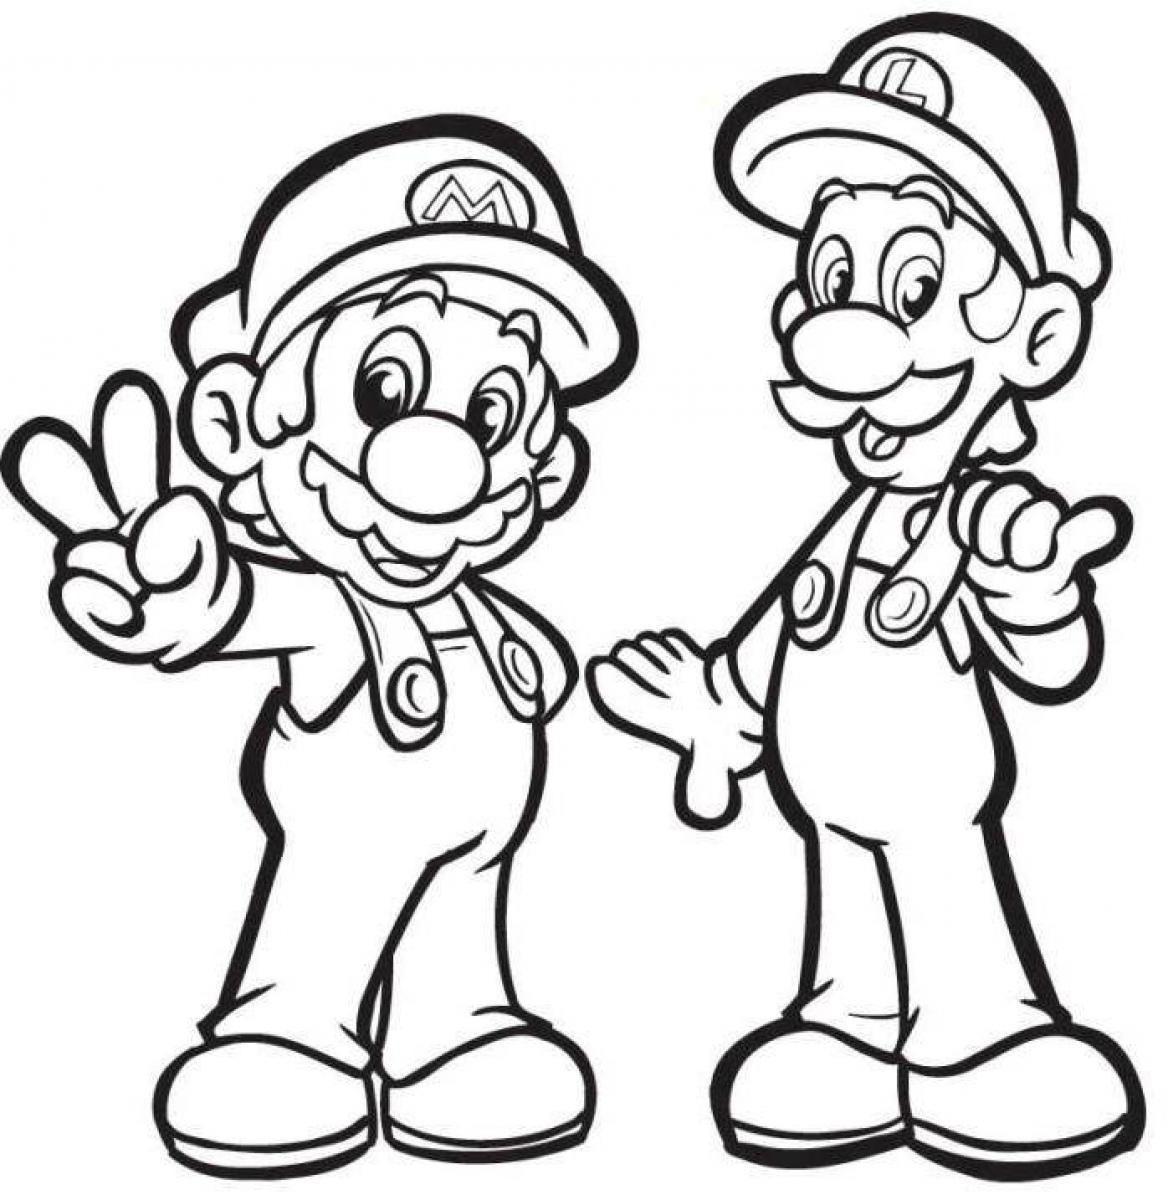 1168x1200 Luigi Coloring Pages, Printable Luigi Coloring Pages, Free Luigi